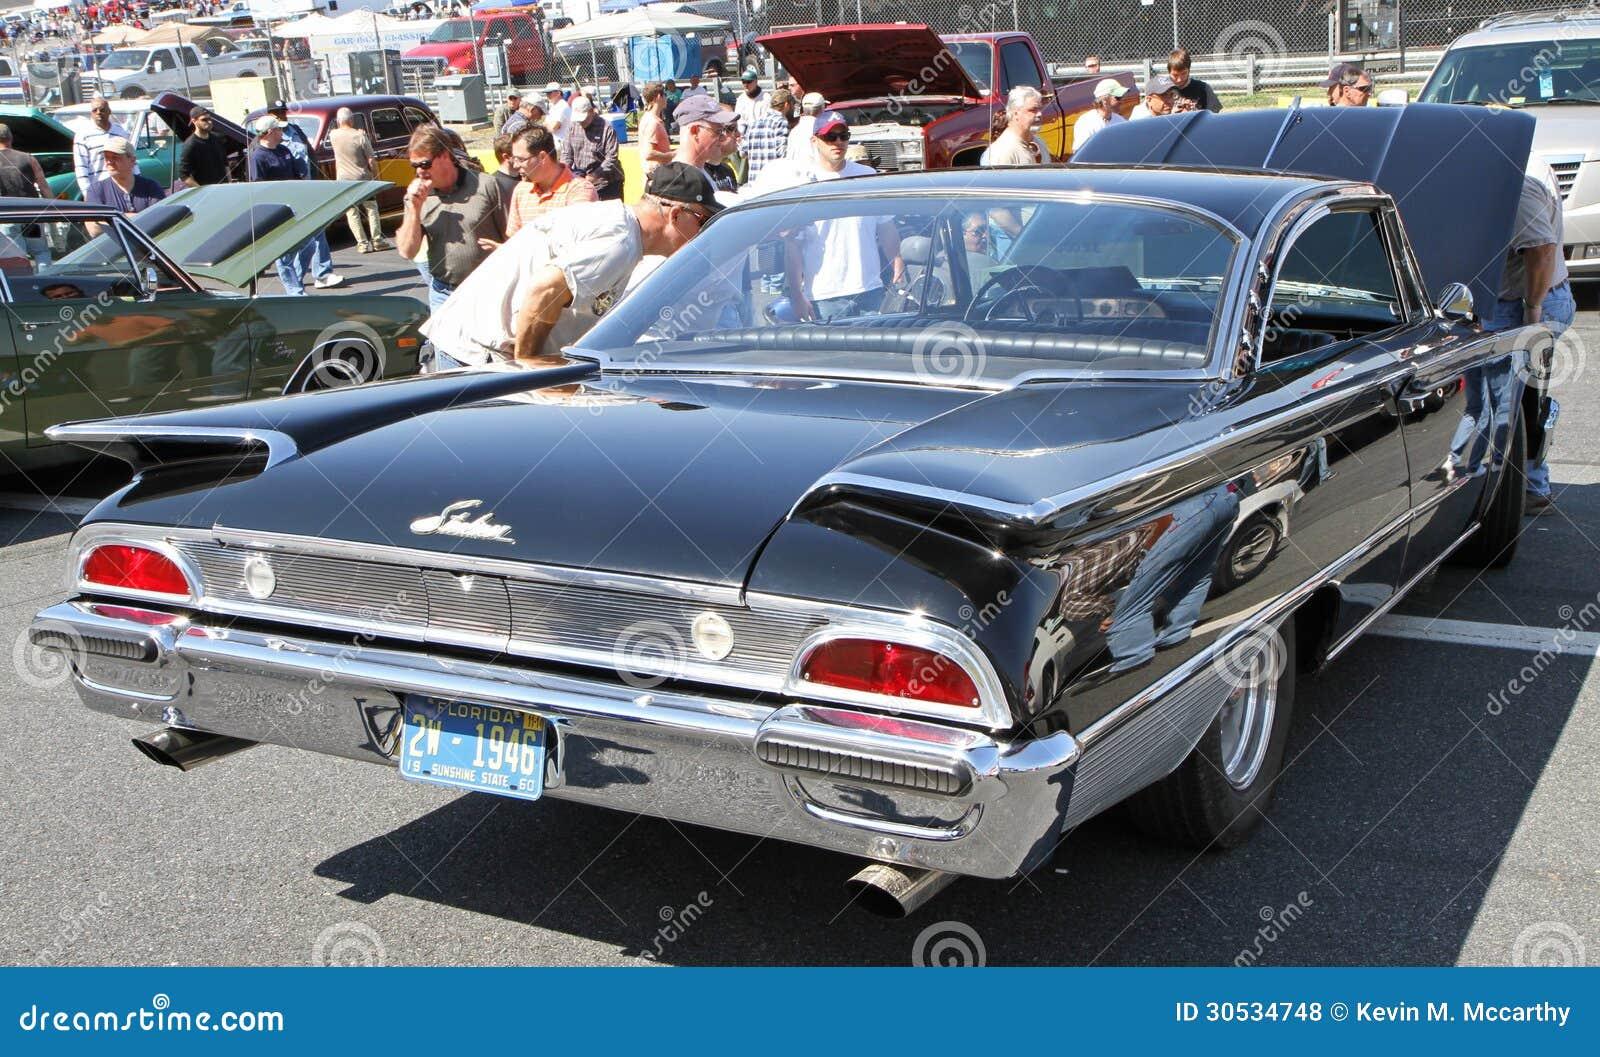 Ford Car Shows In North Carolina